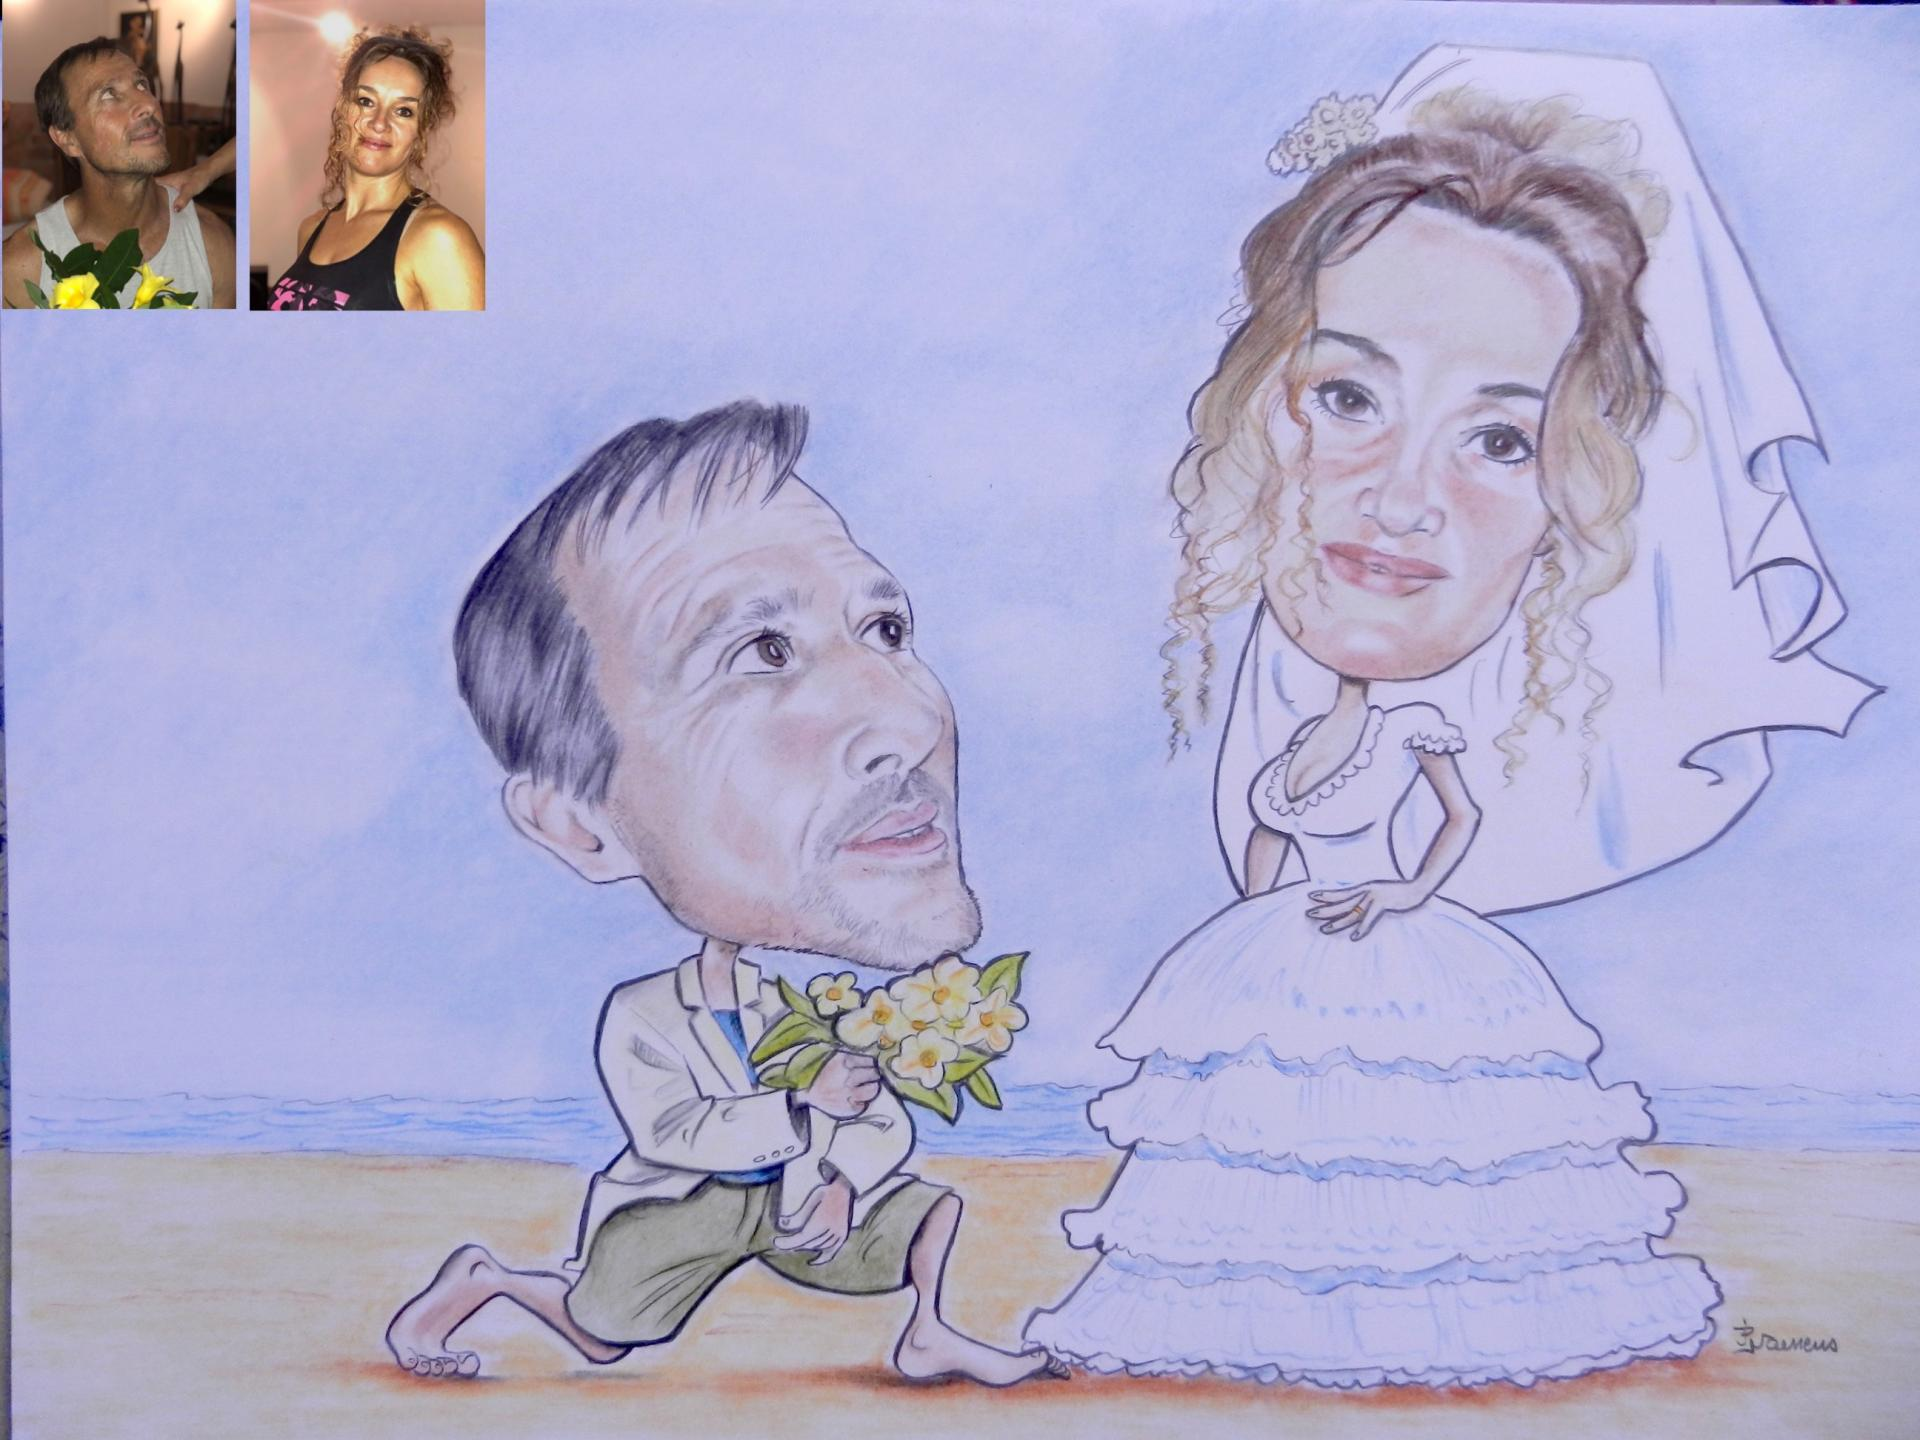 Mariage aux iles